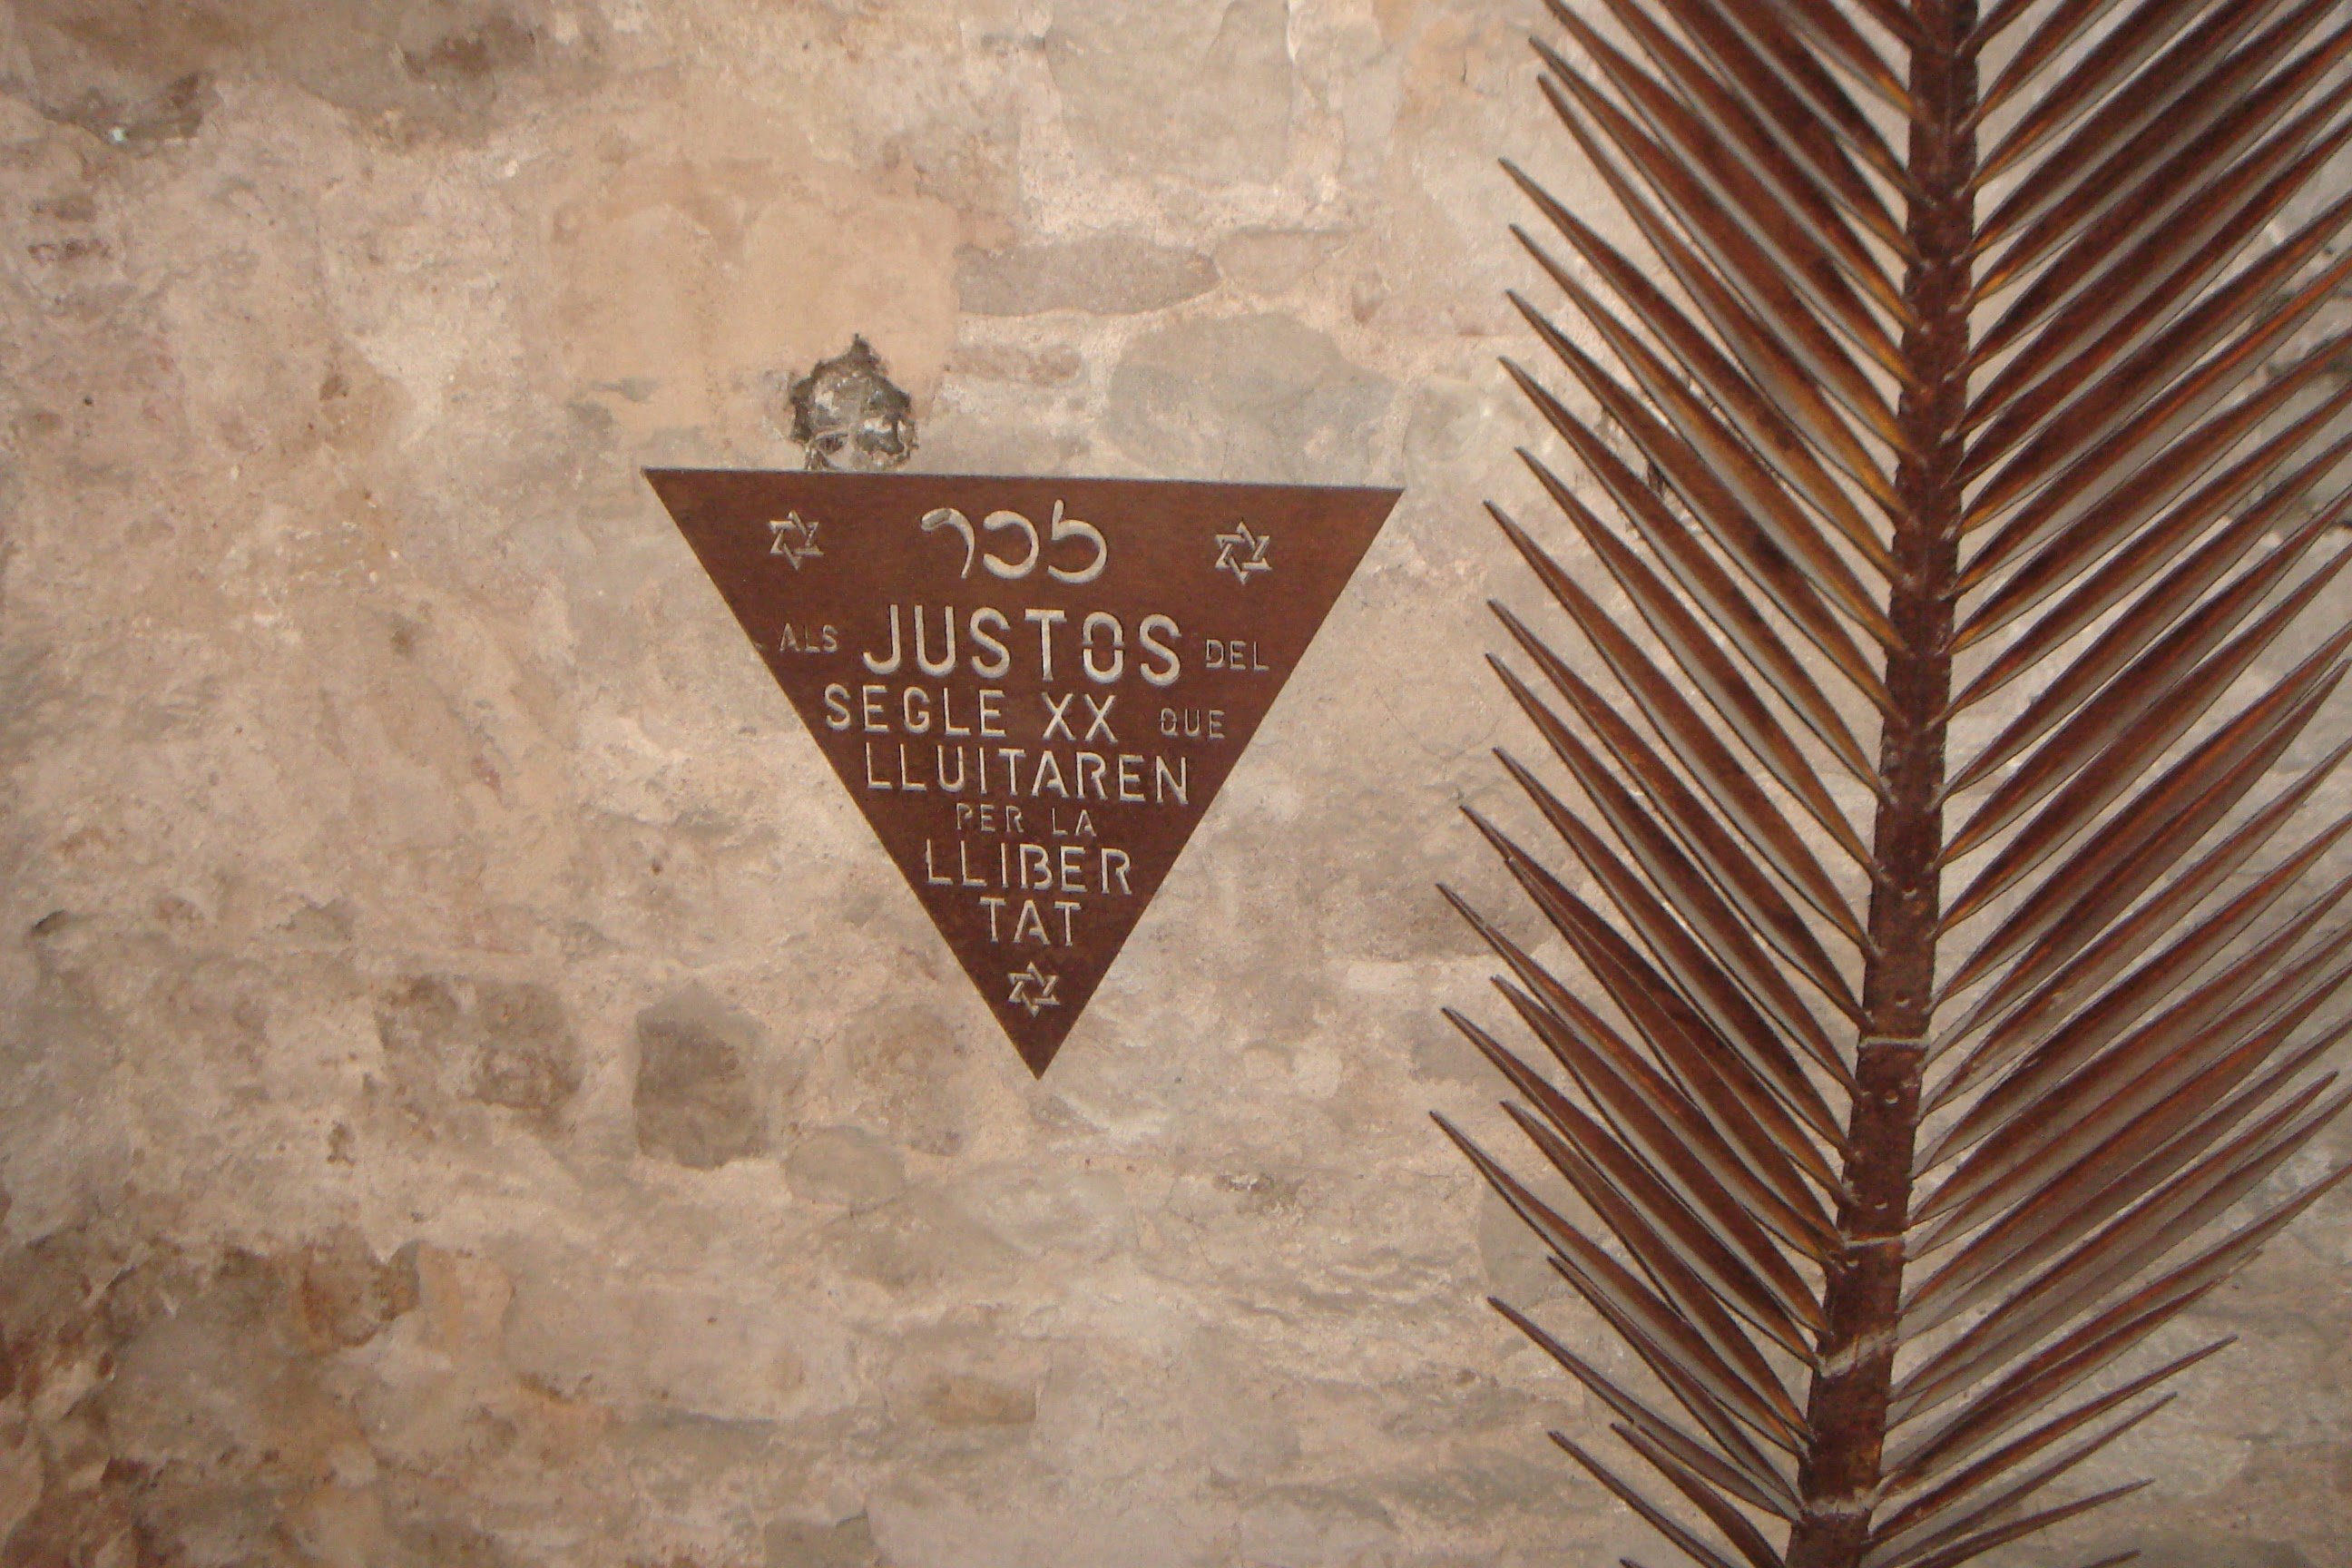 qr-gotic-antoni-muntanyola-35